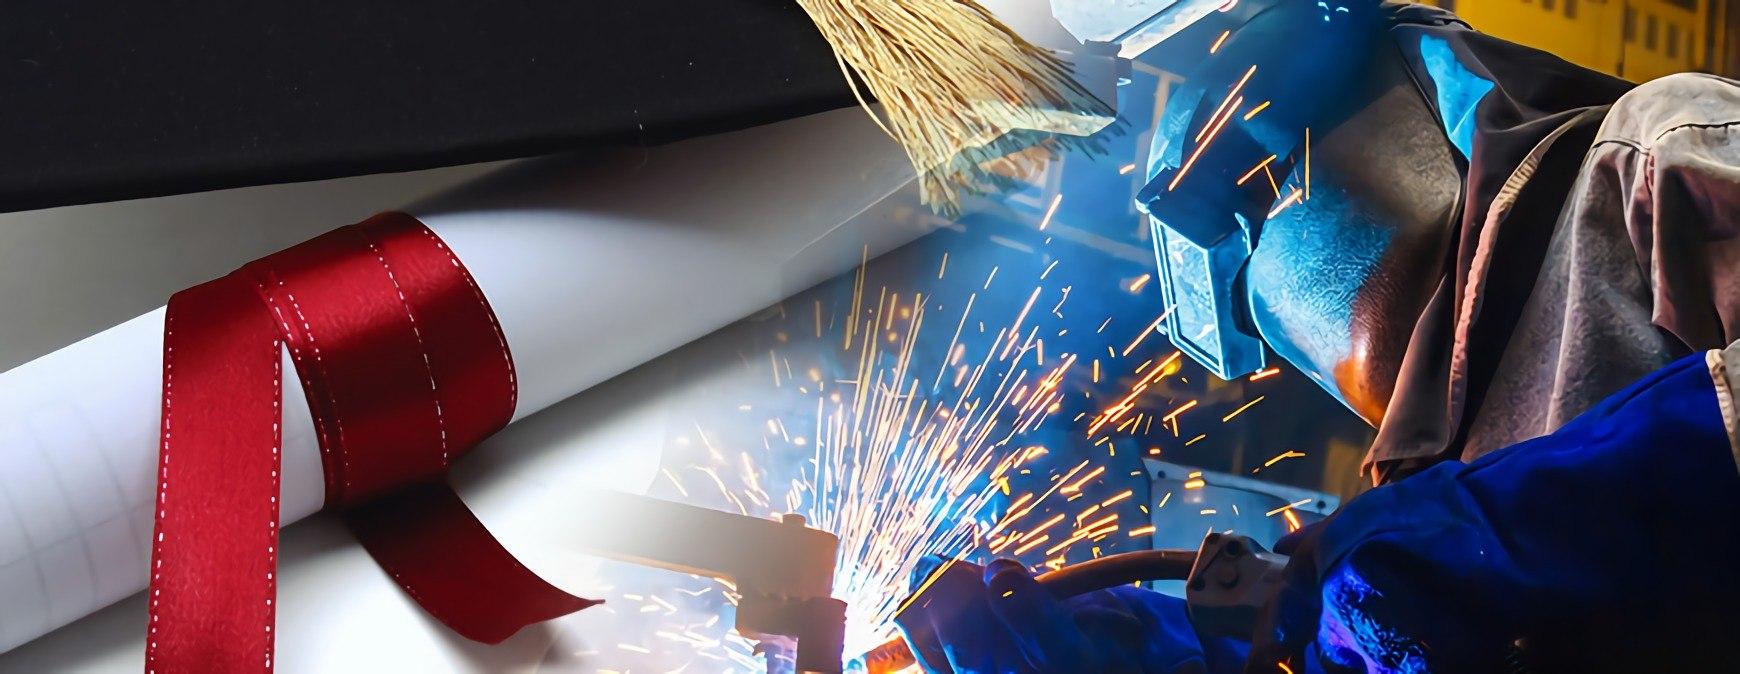 welding diploma